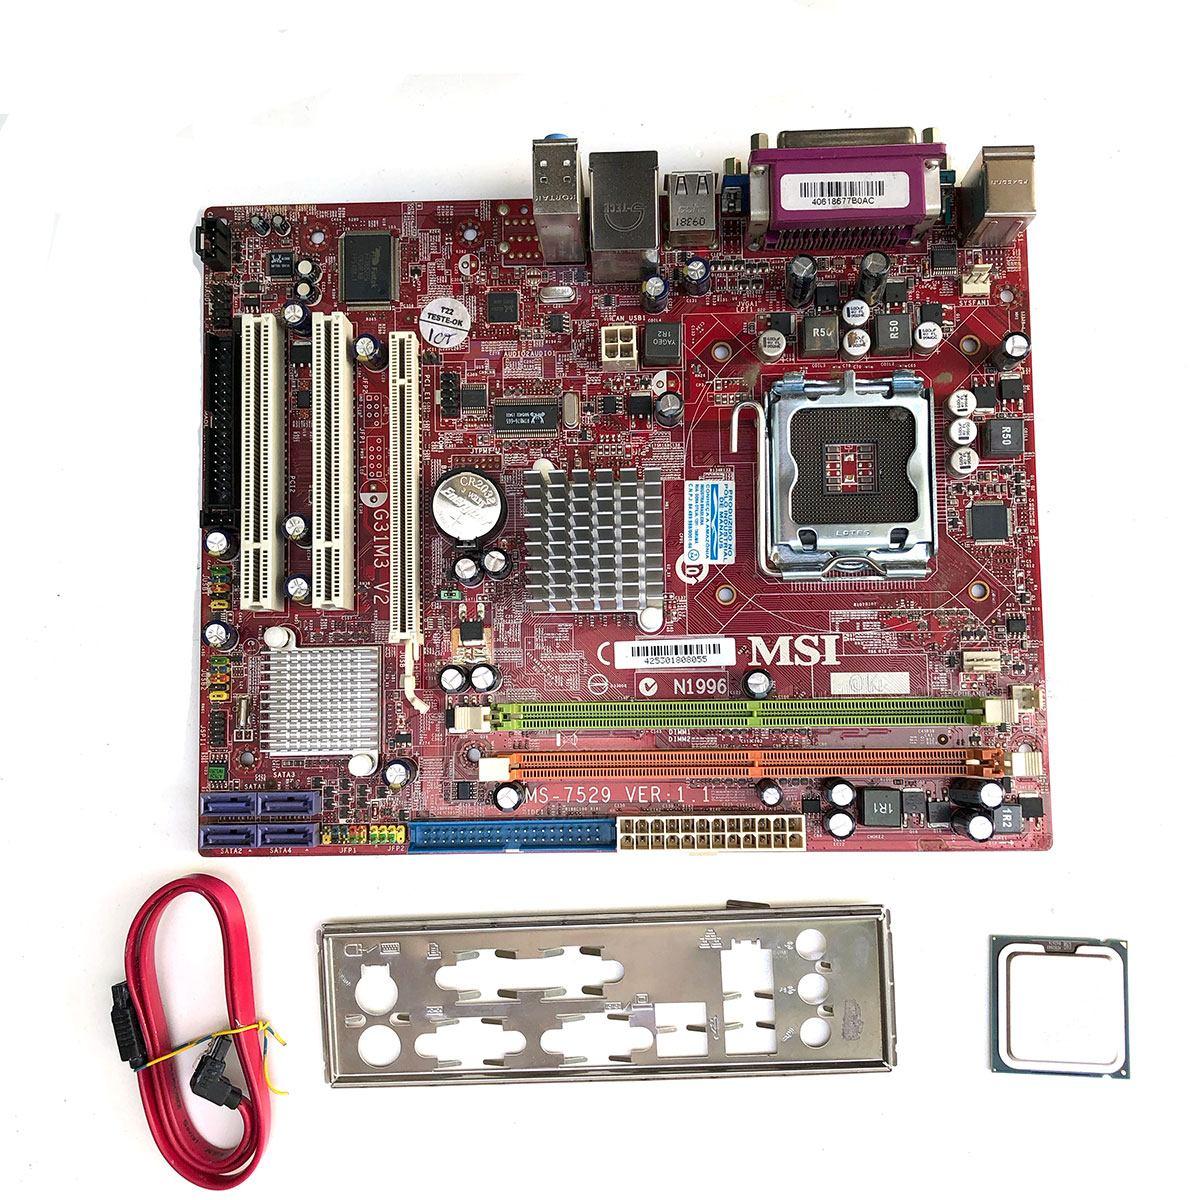 MSI G31M3-F V2 (3 Audio Ports) Drivers for PC